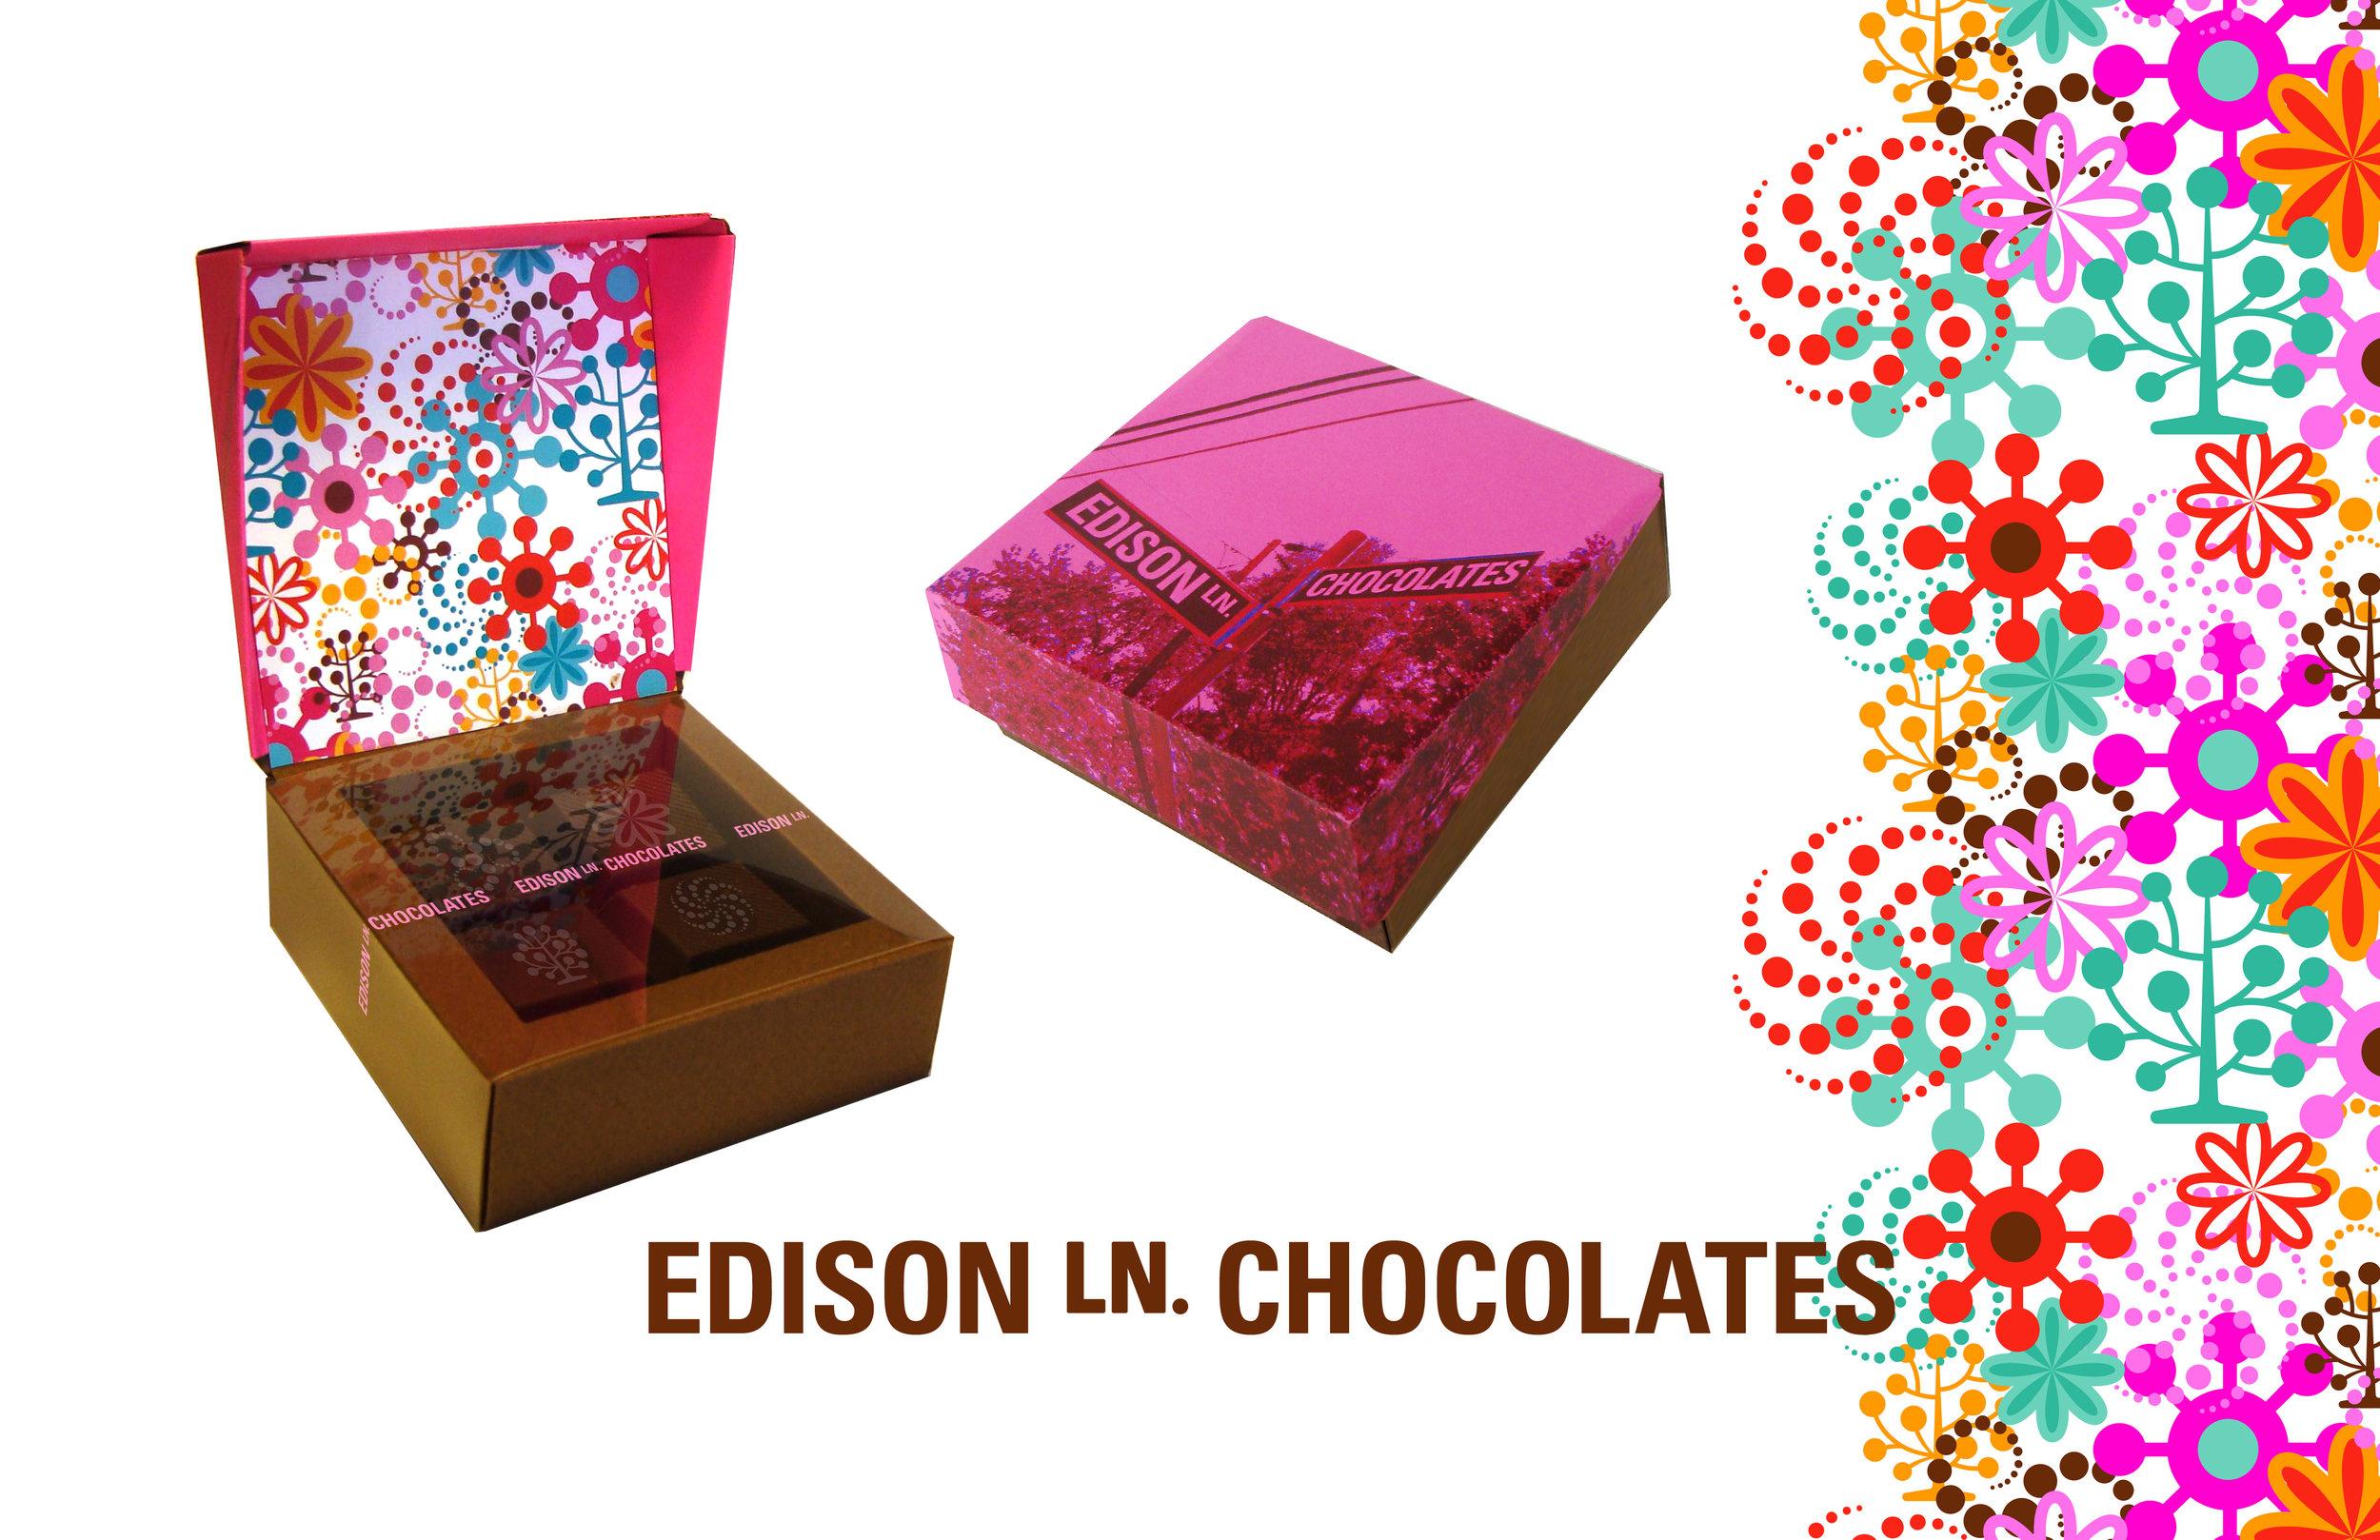 edison-lane-chocolates_3690392388_o.jpg